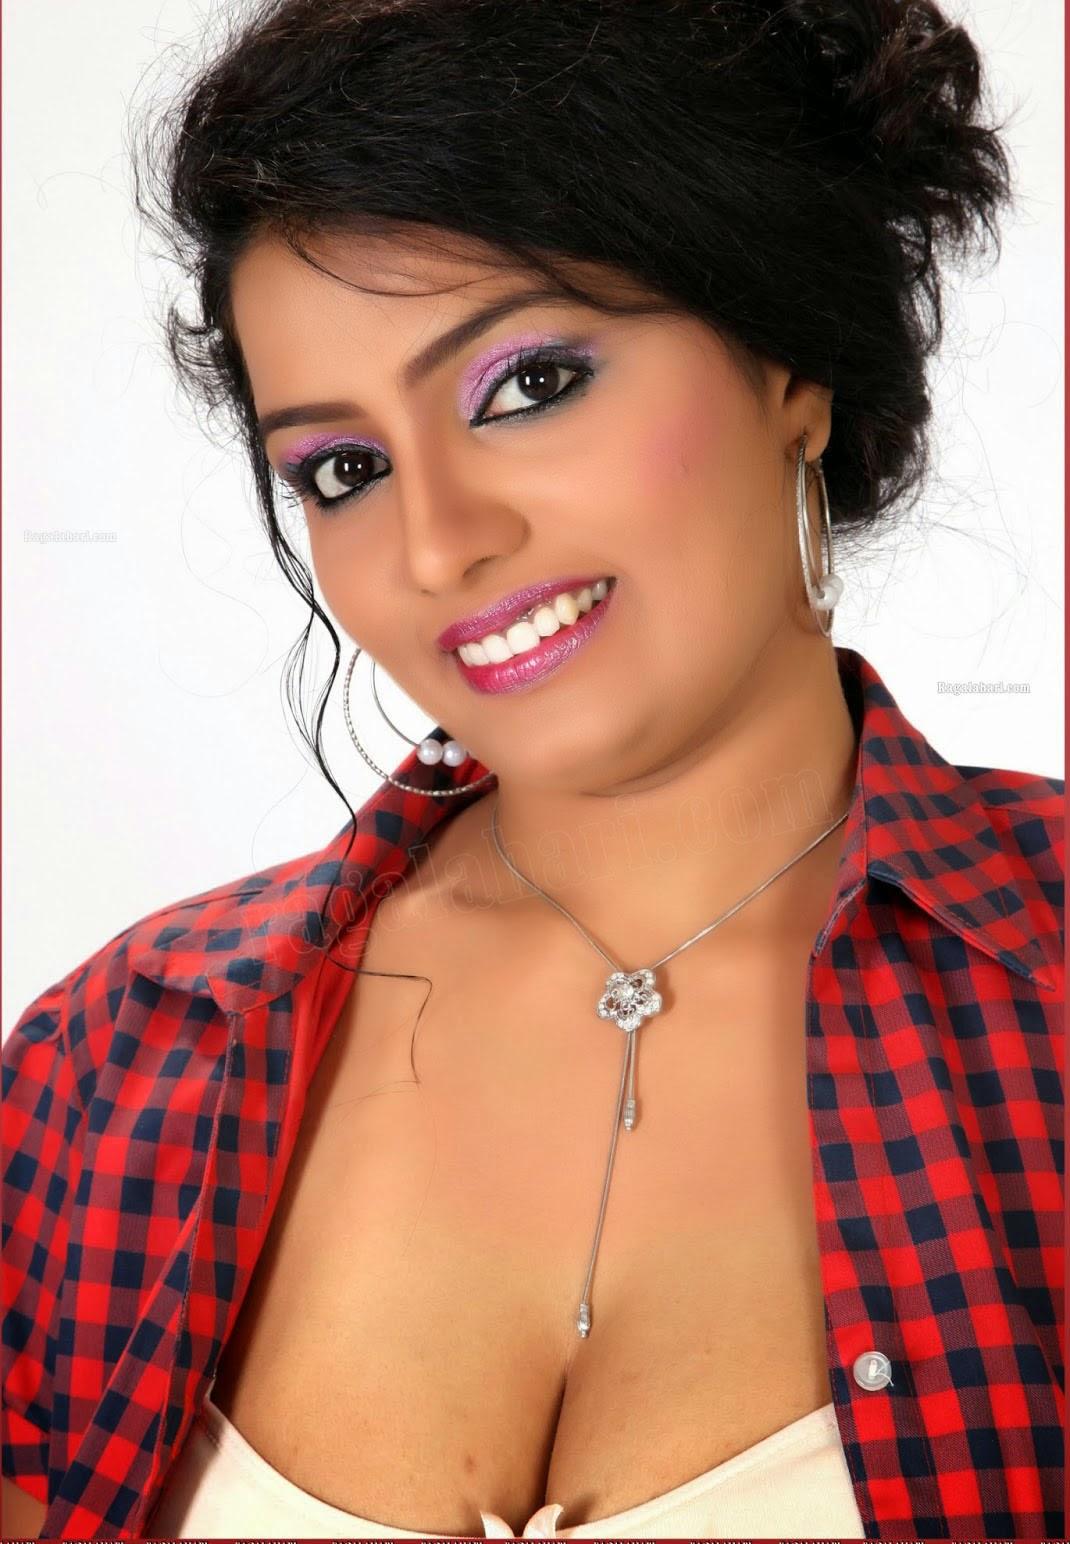 indian wife hanimoon bech sexy photo